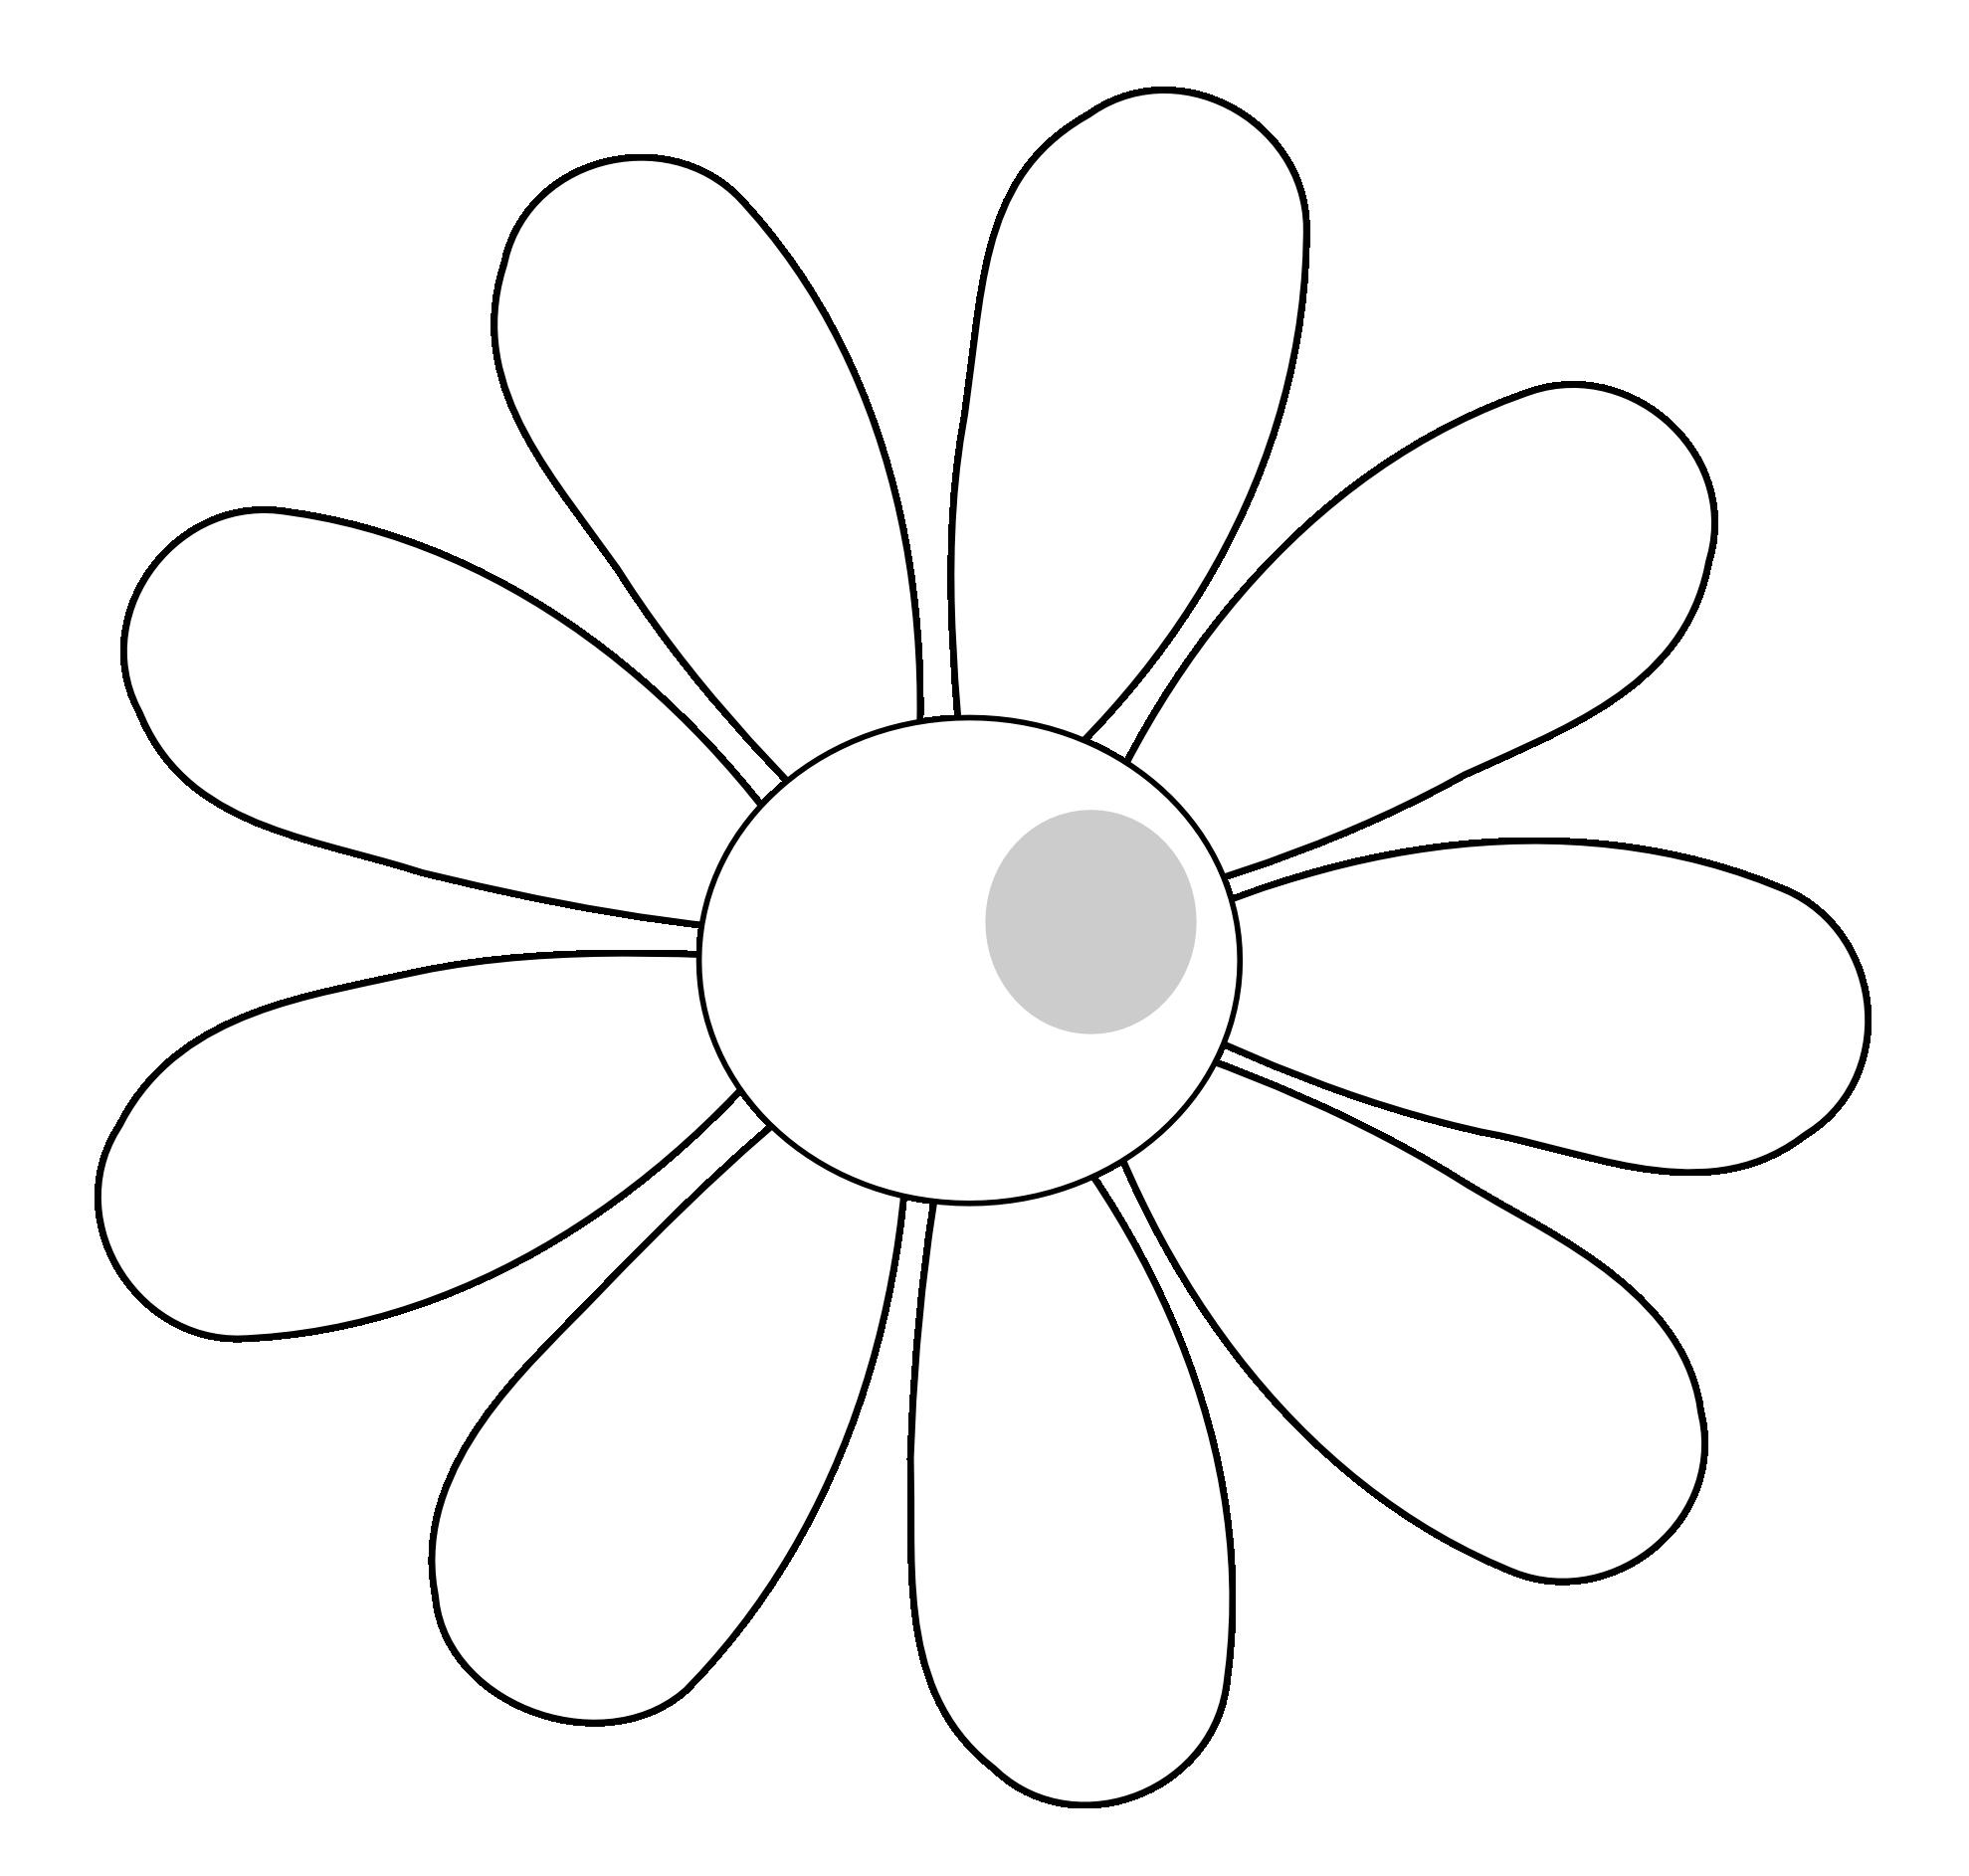 Daisies clipart flowerblack. Line art flower black